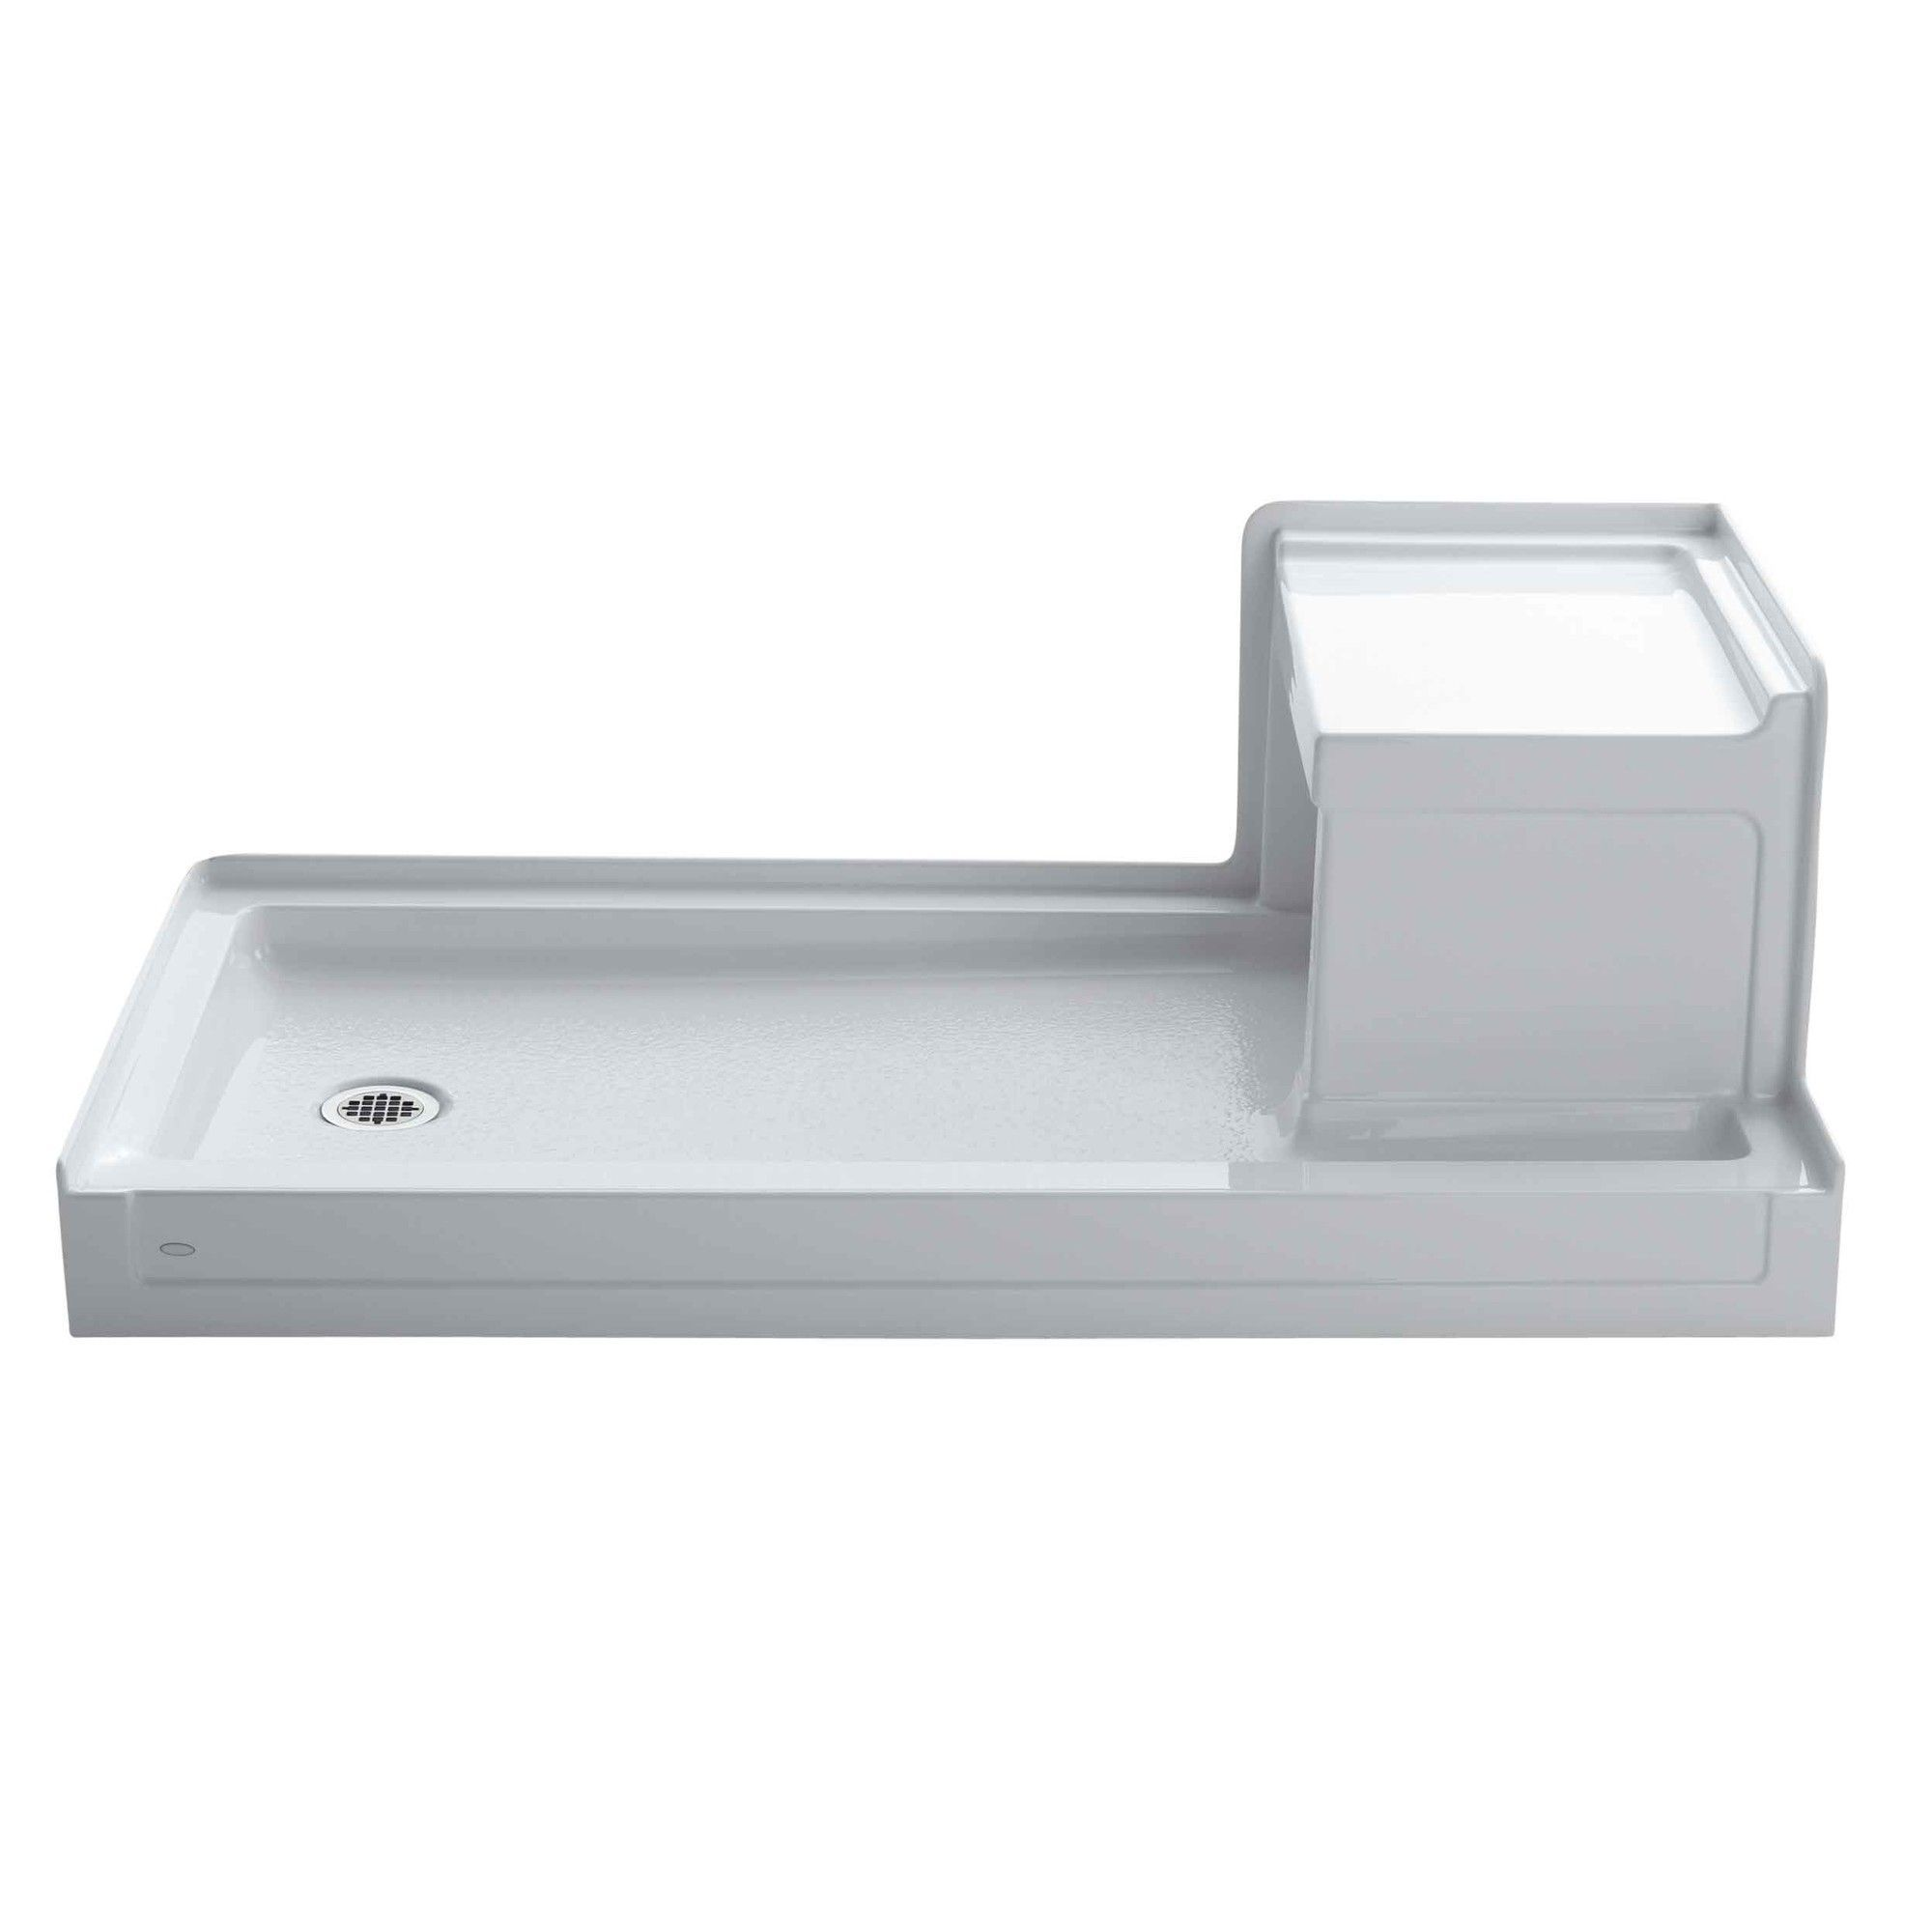 Tresham 60 X 32 Single Threshold Left Hand Drain Shower Base